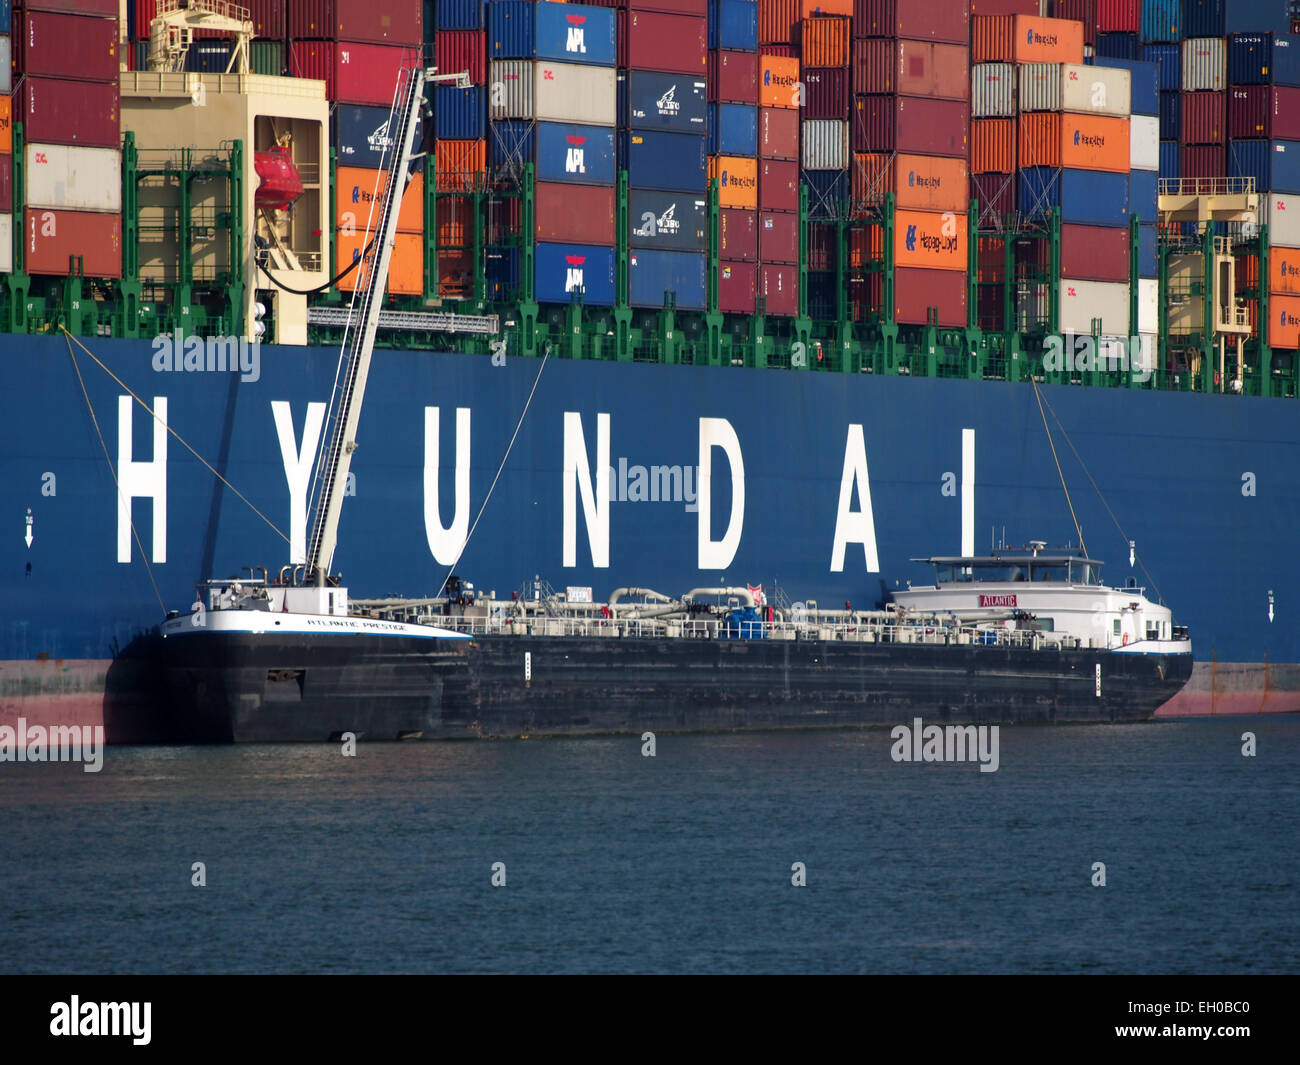 Atlantic Prestige ENI 02333489, Amazonehaven, Port of Rotterdam, pic2 - Stock Image